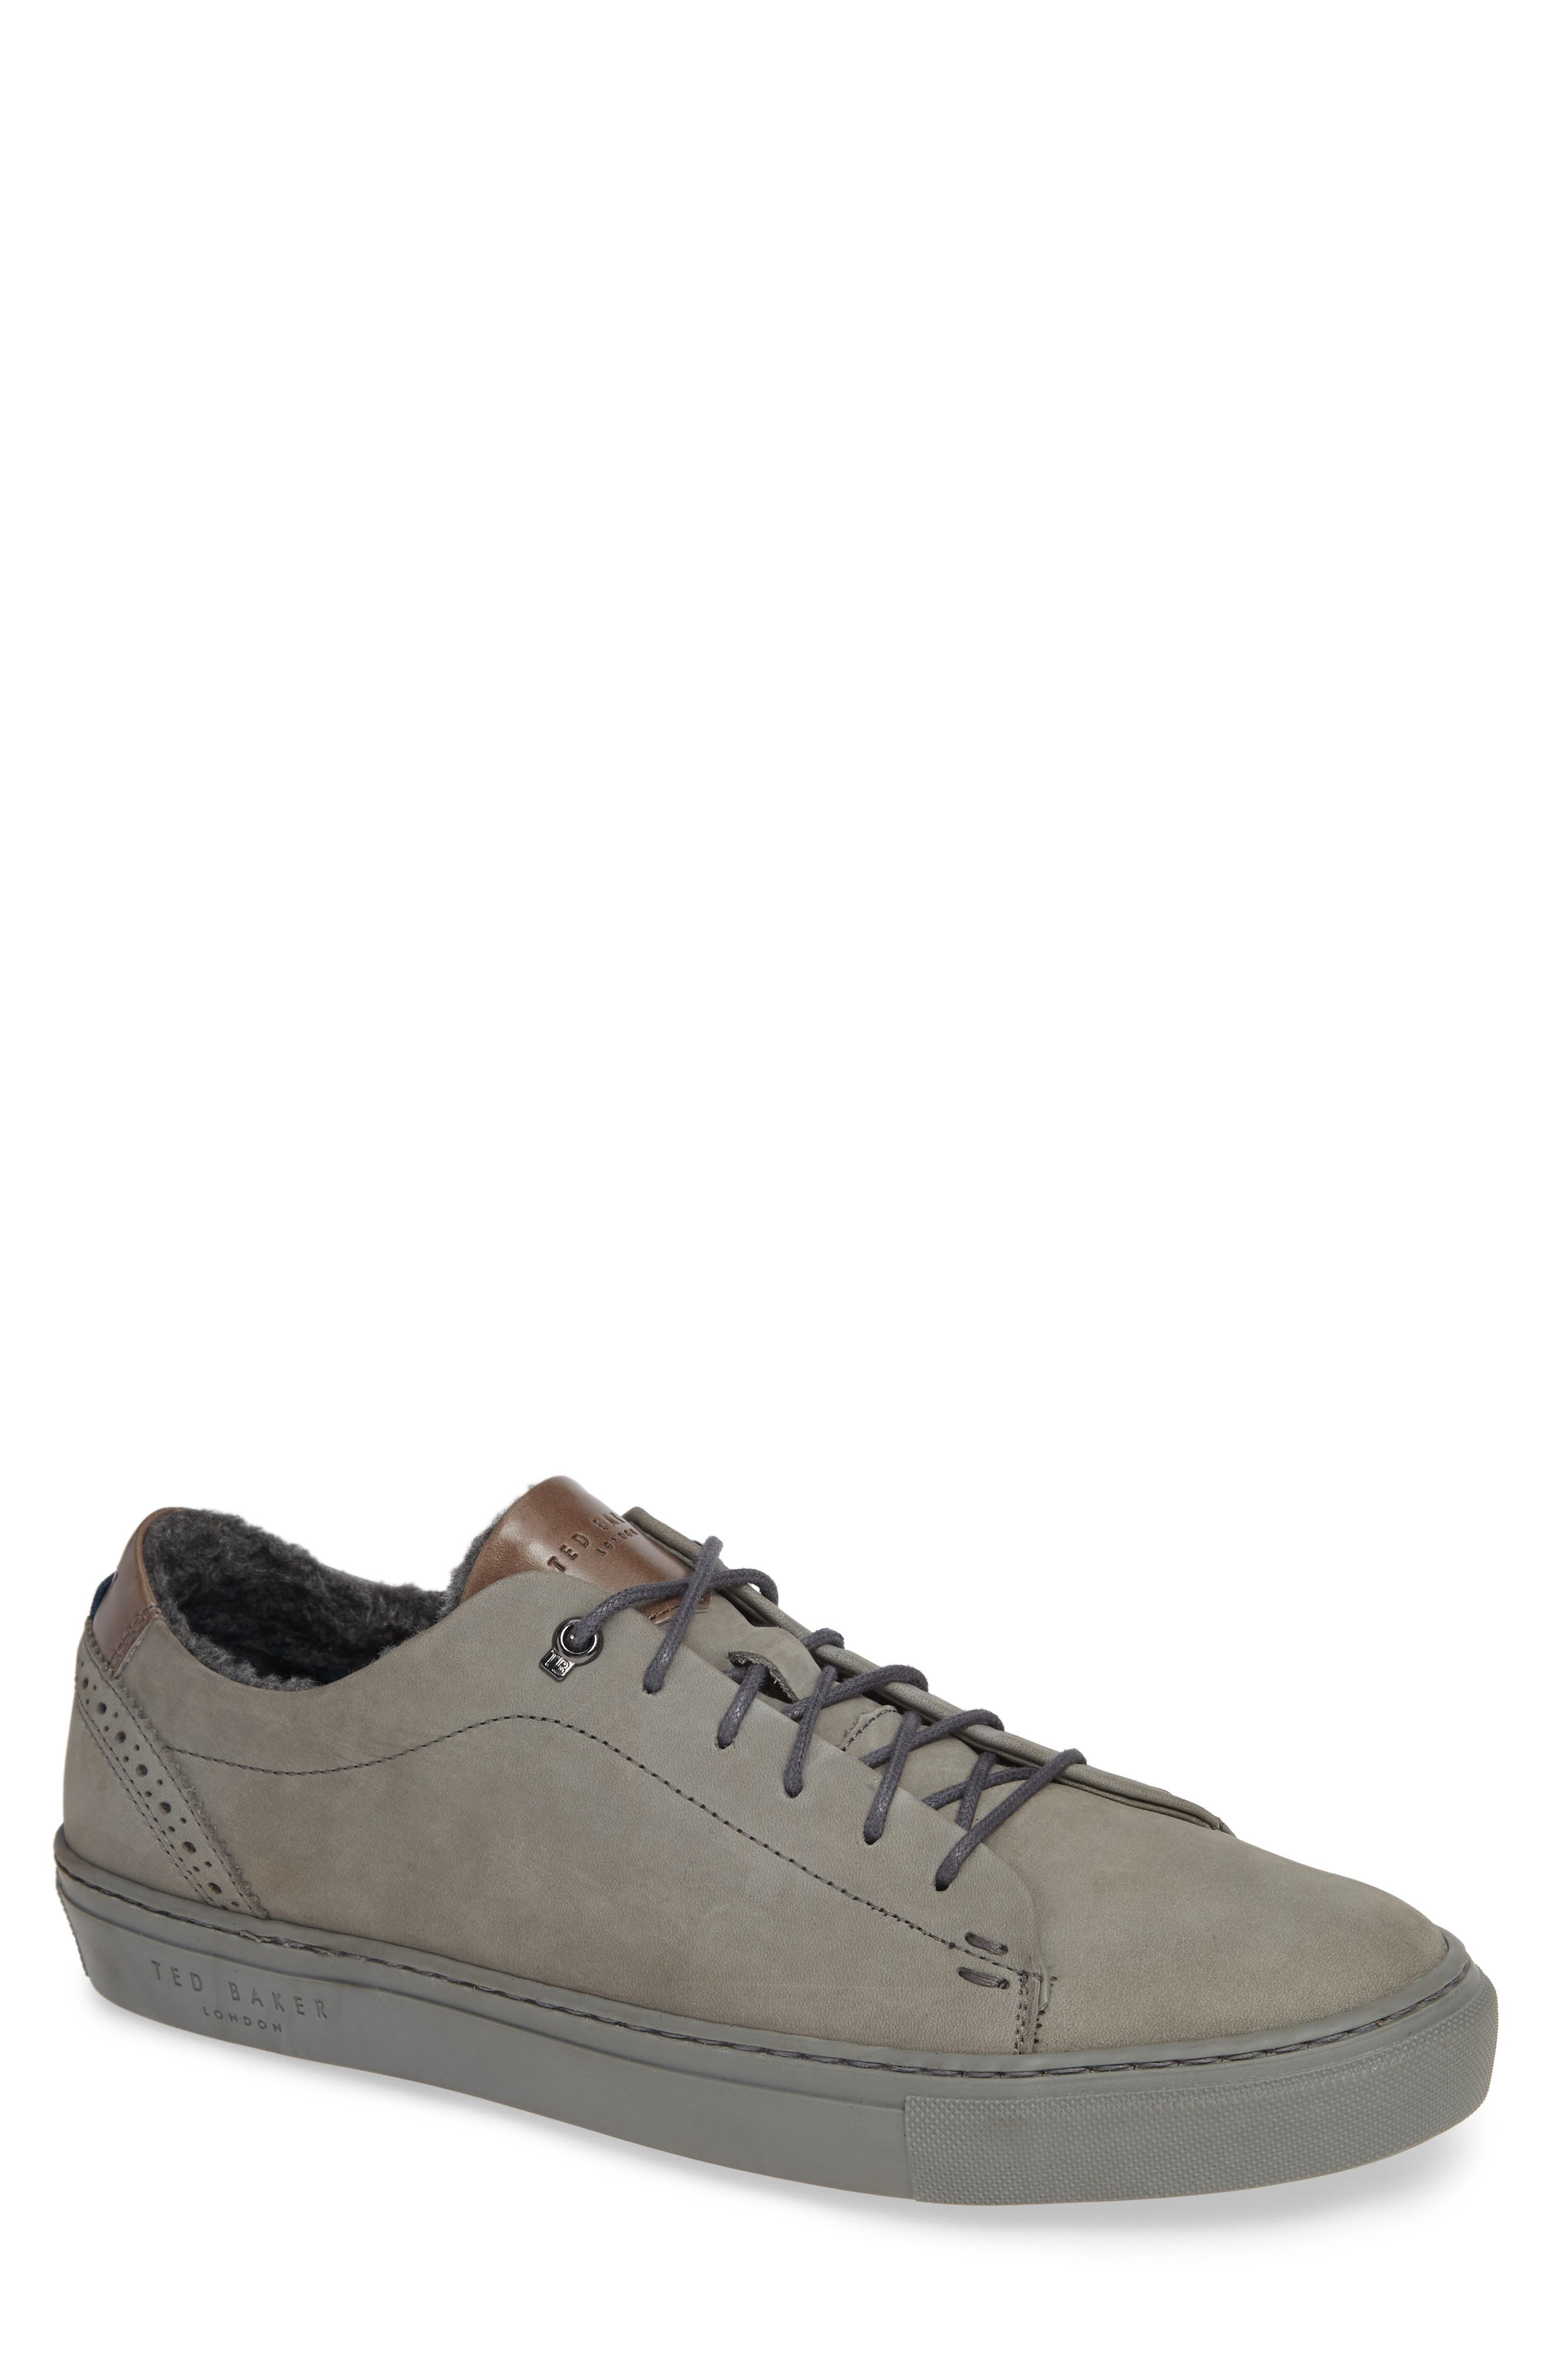 Dahvid Nubuck Sneaker,                         Main,                         color, GREY NUBUCK